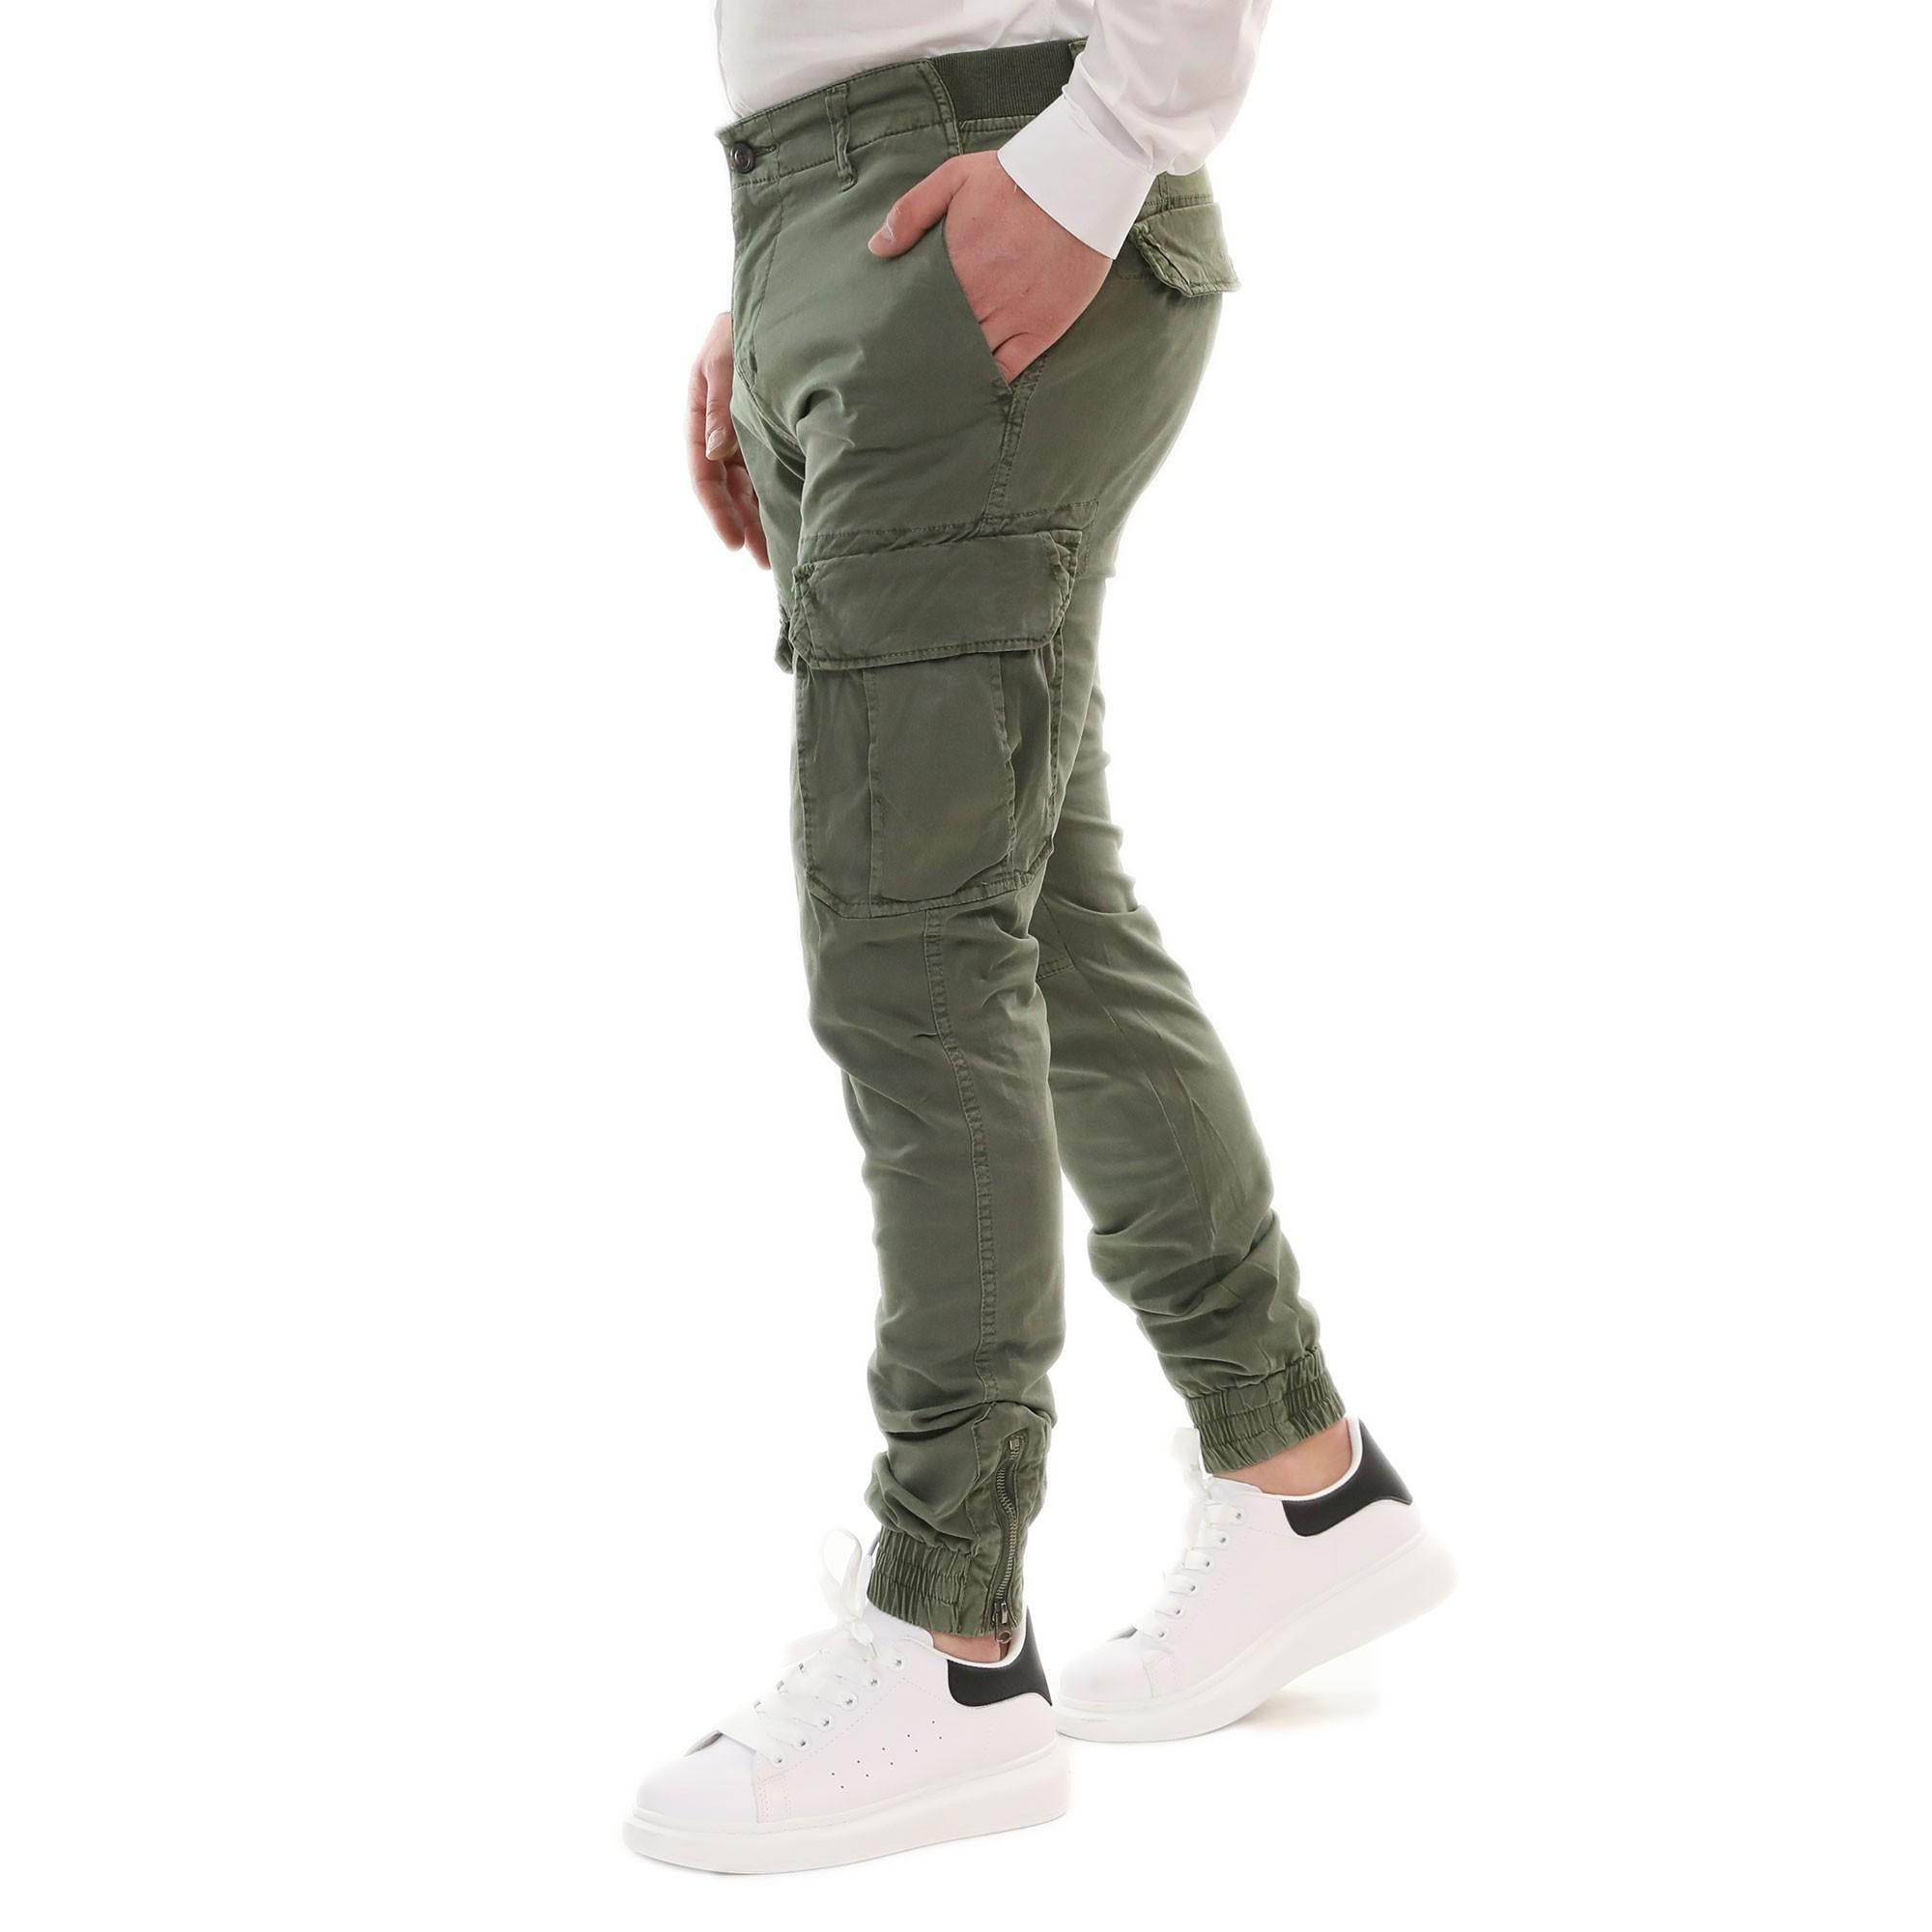 Pantalone-Uomo-Cargo-Primaverile-Con-Tasconi-Verde-Blu-Beige-SlimFit-Pantaloni miniatura 6